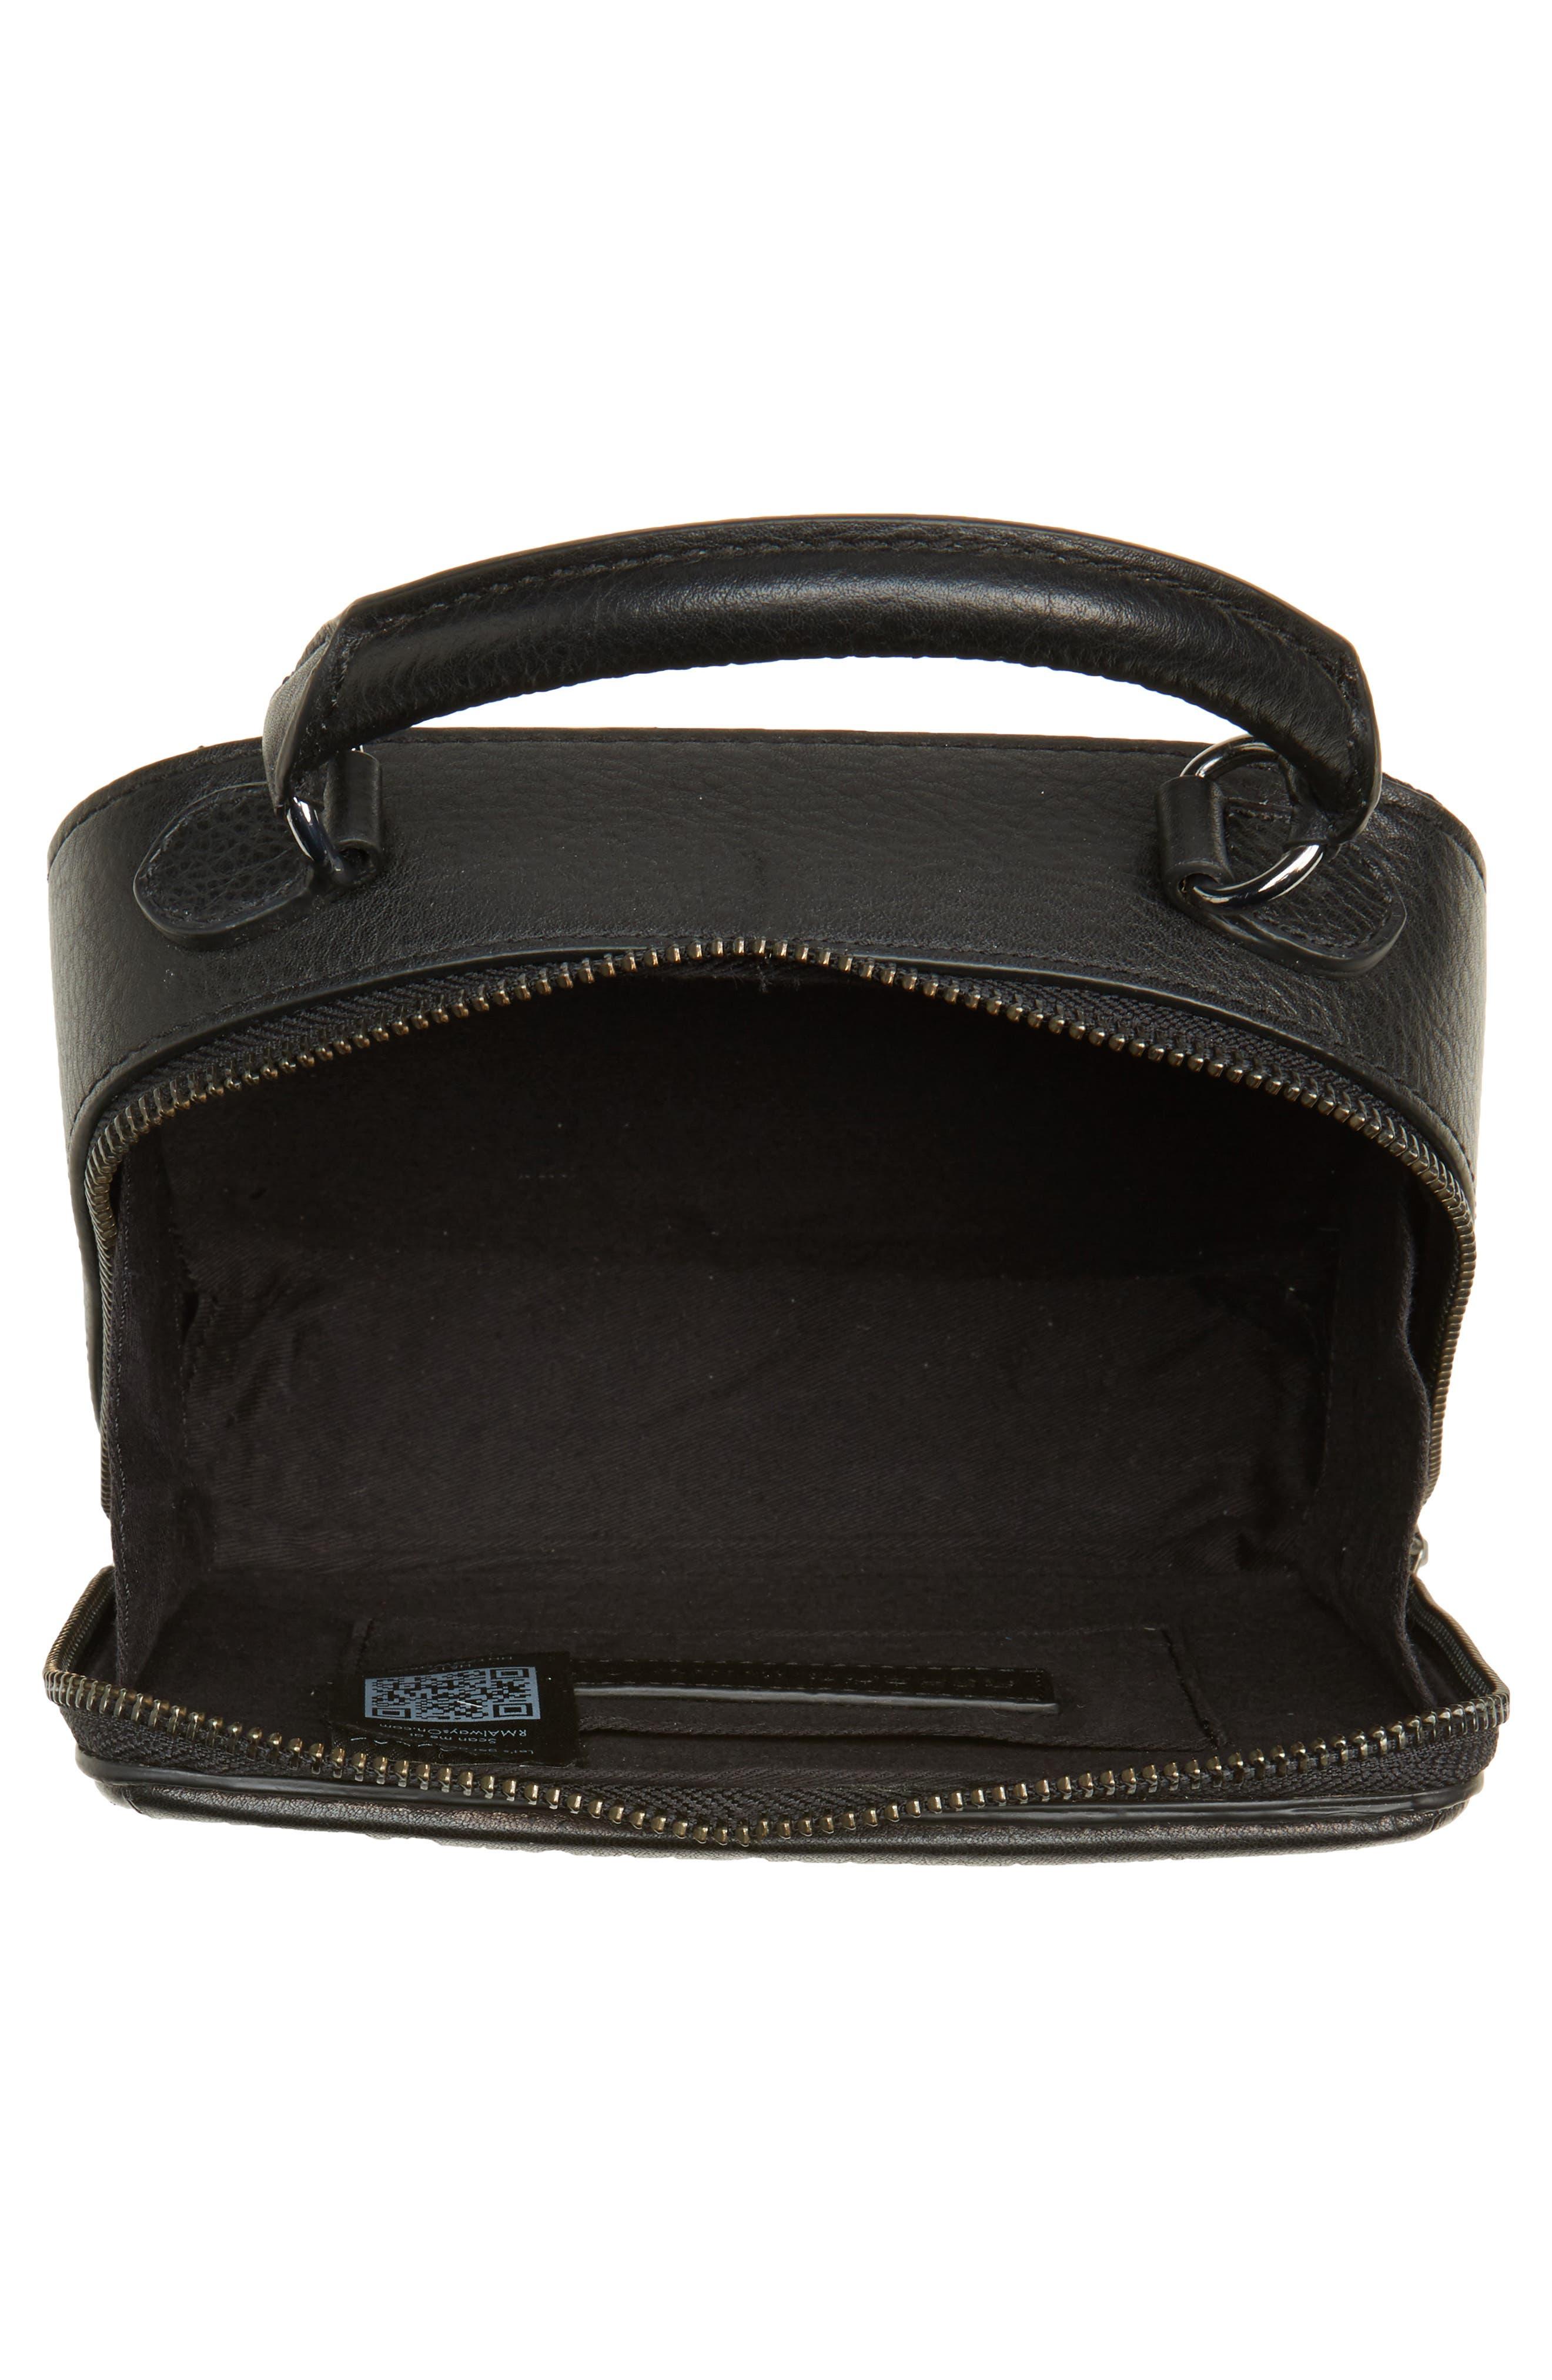 Wonder Box Embellished Crossbody Bag,                             Alternate thumbnail 4, color,                             Black Metallic Multi